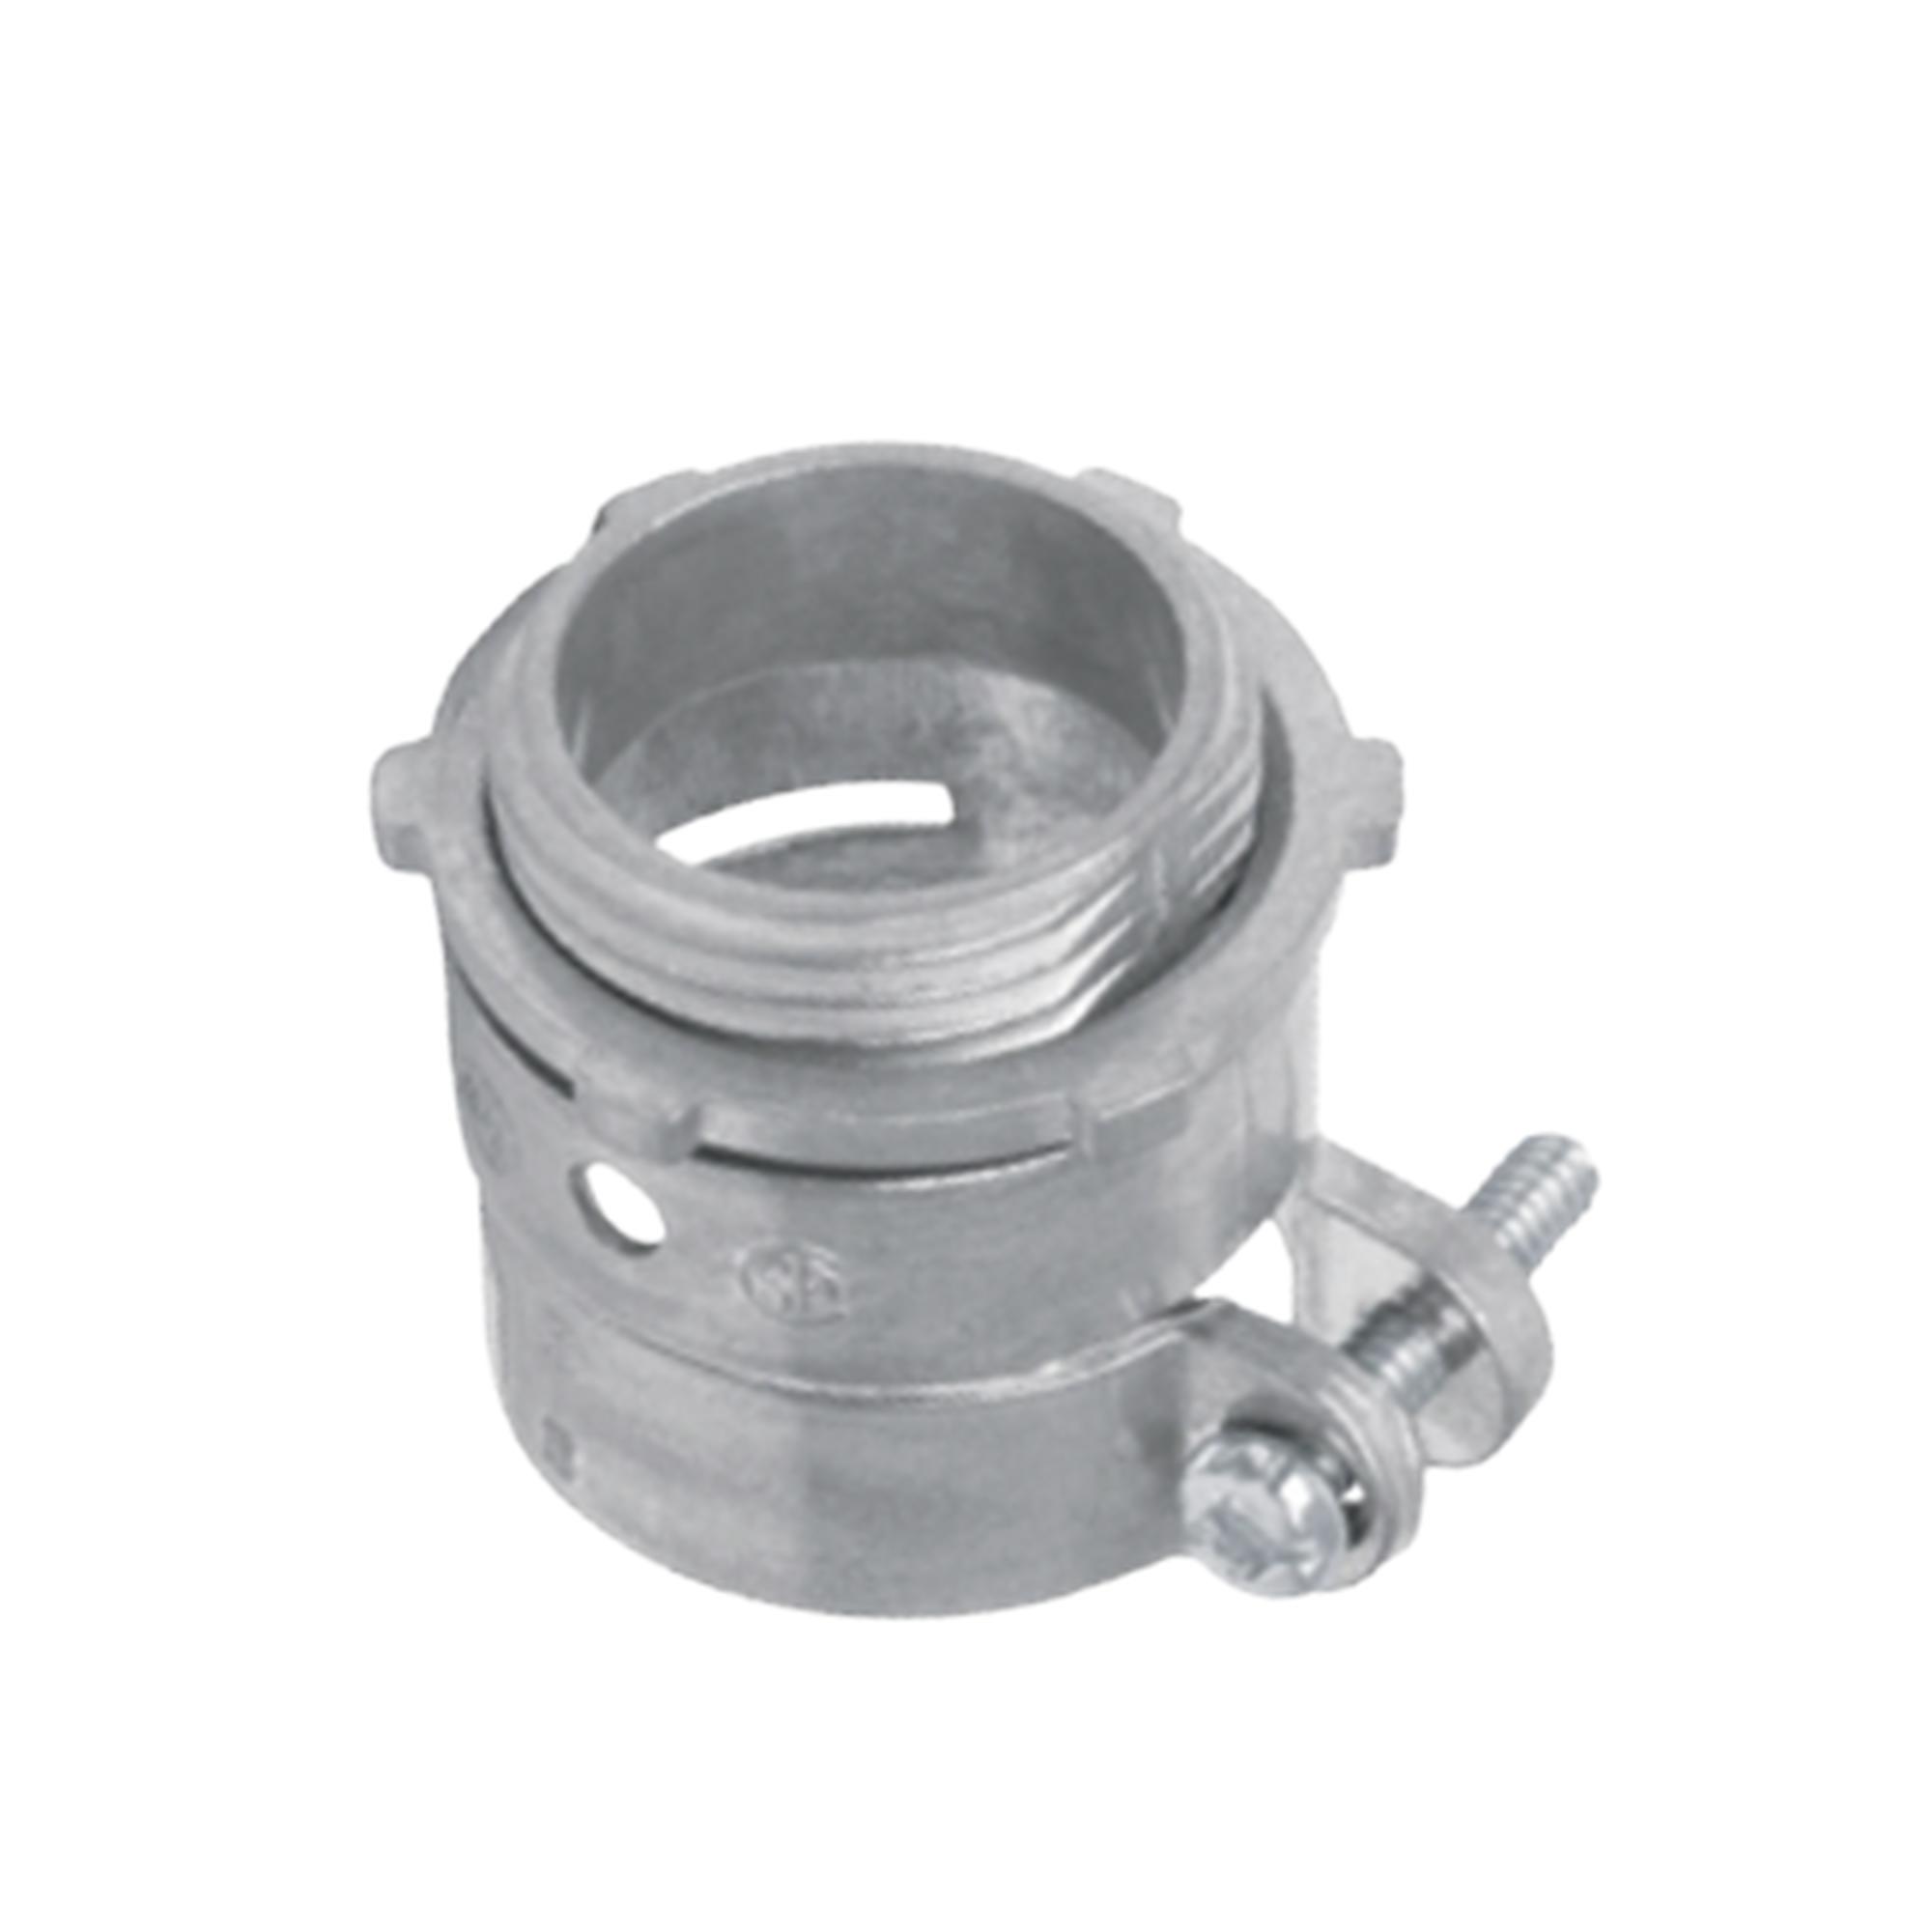 Conector recto para tubo flexible de 1 (25 mm).